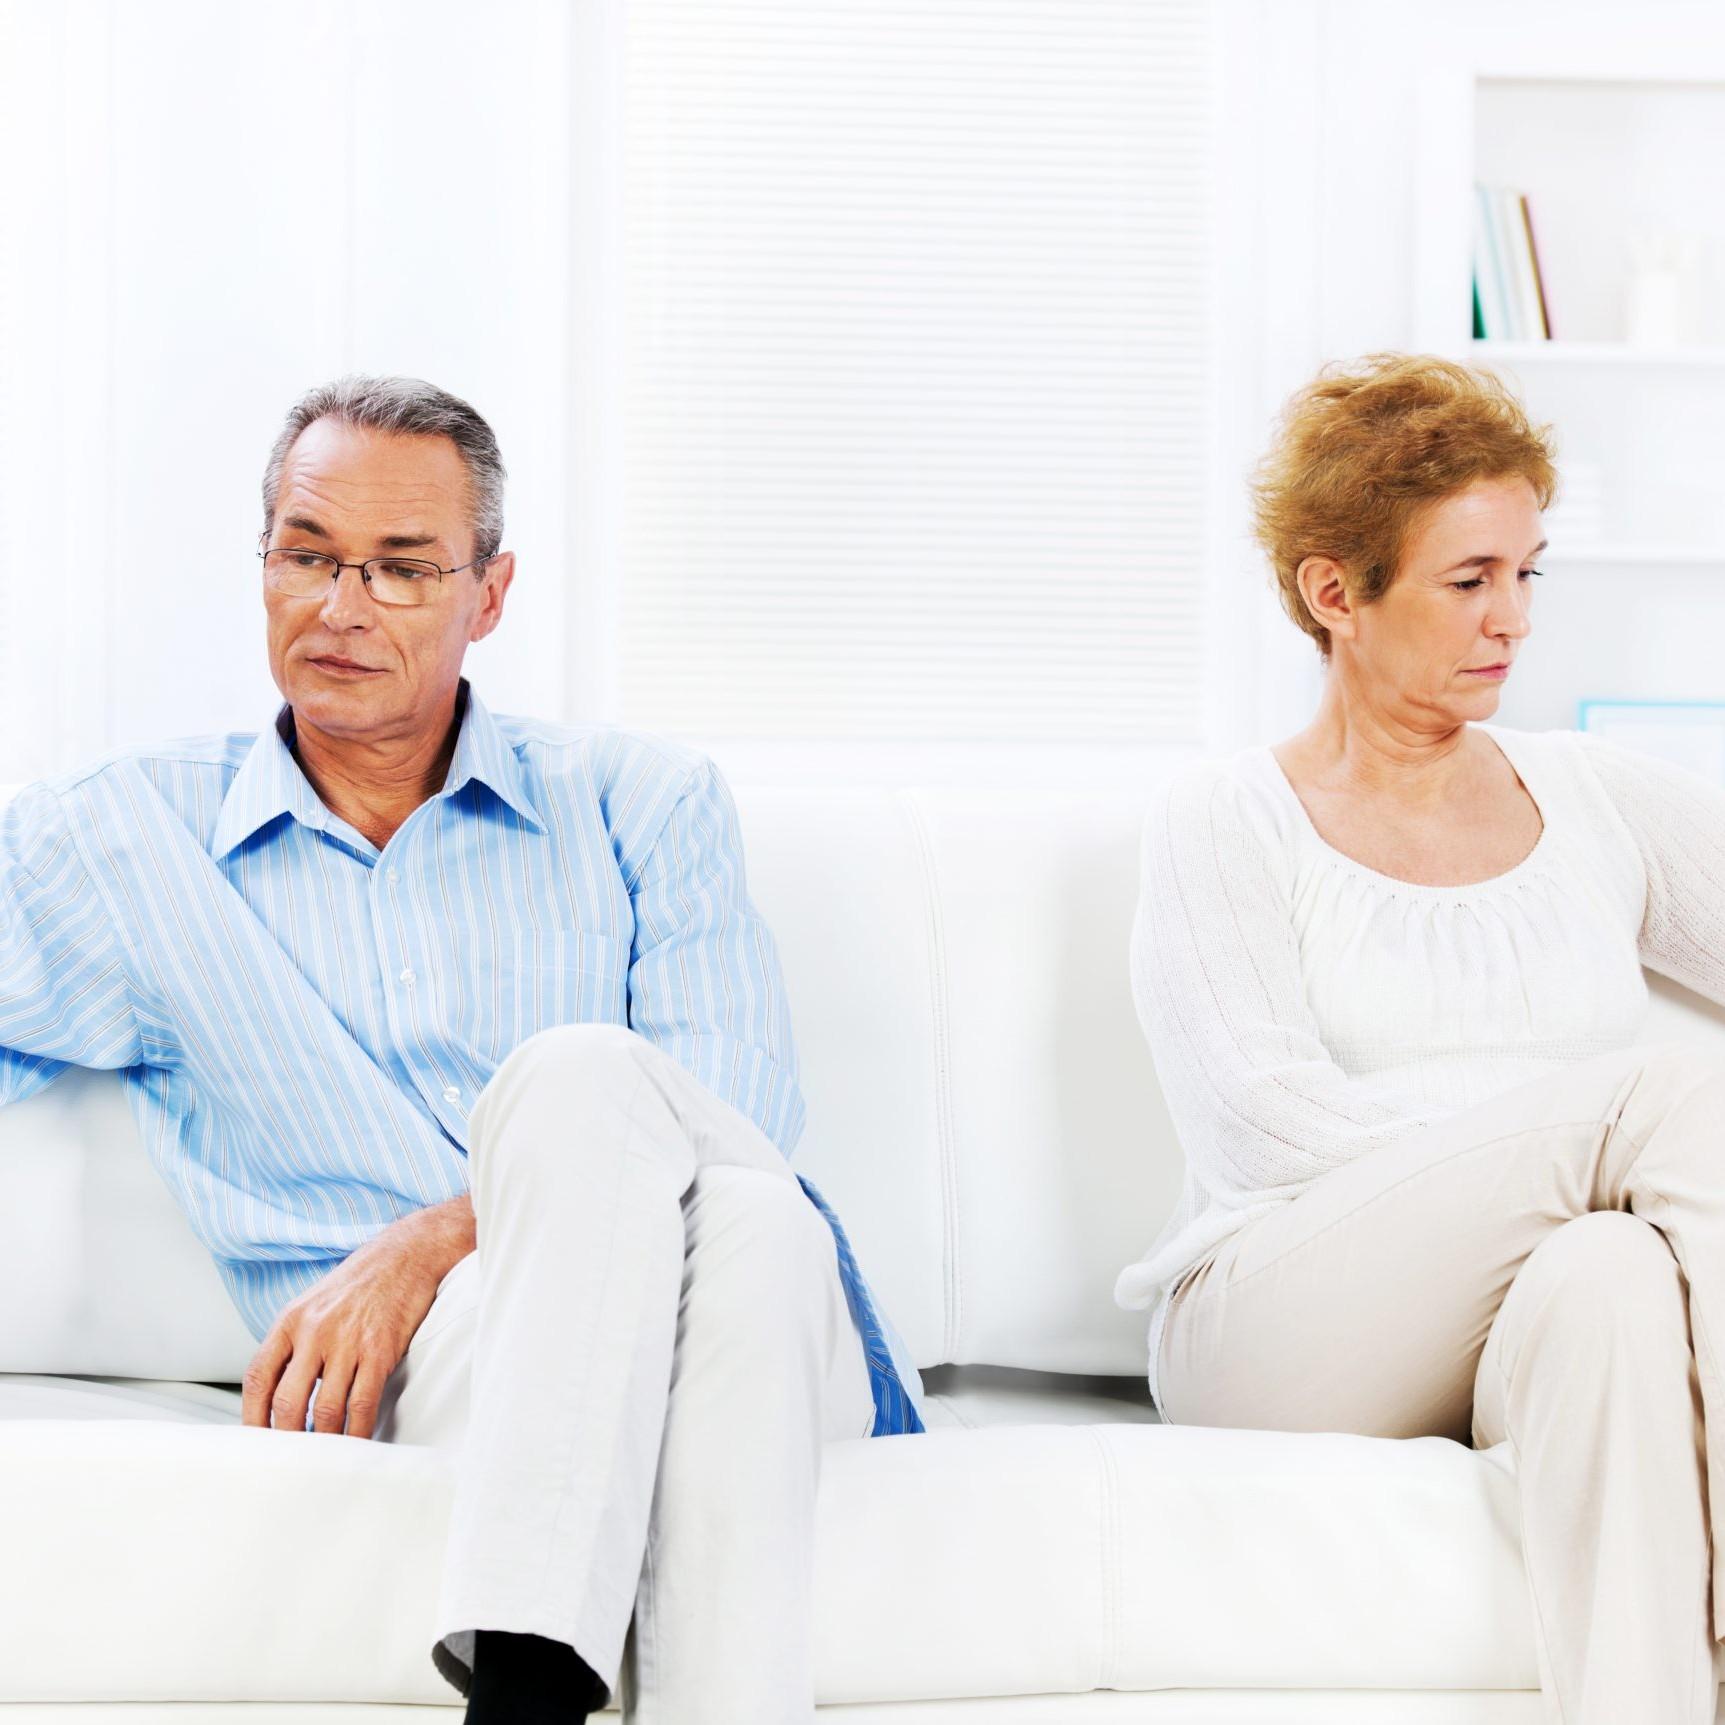 el maltrato en la pareja